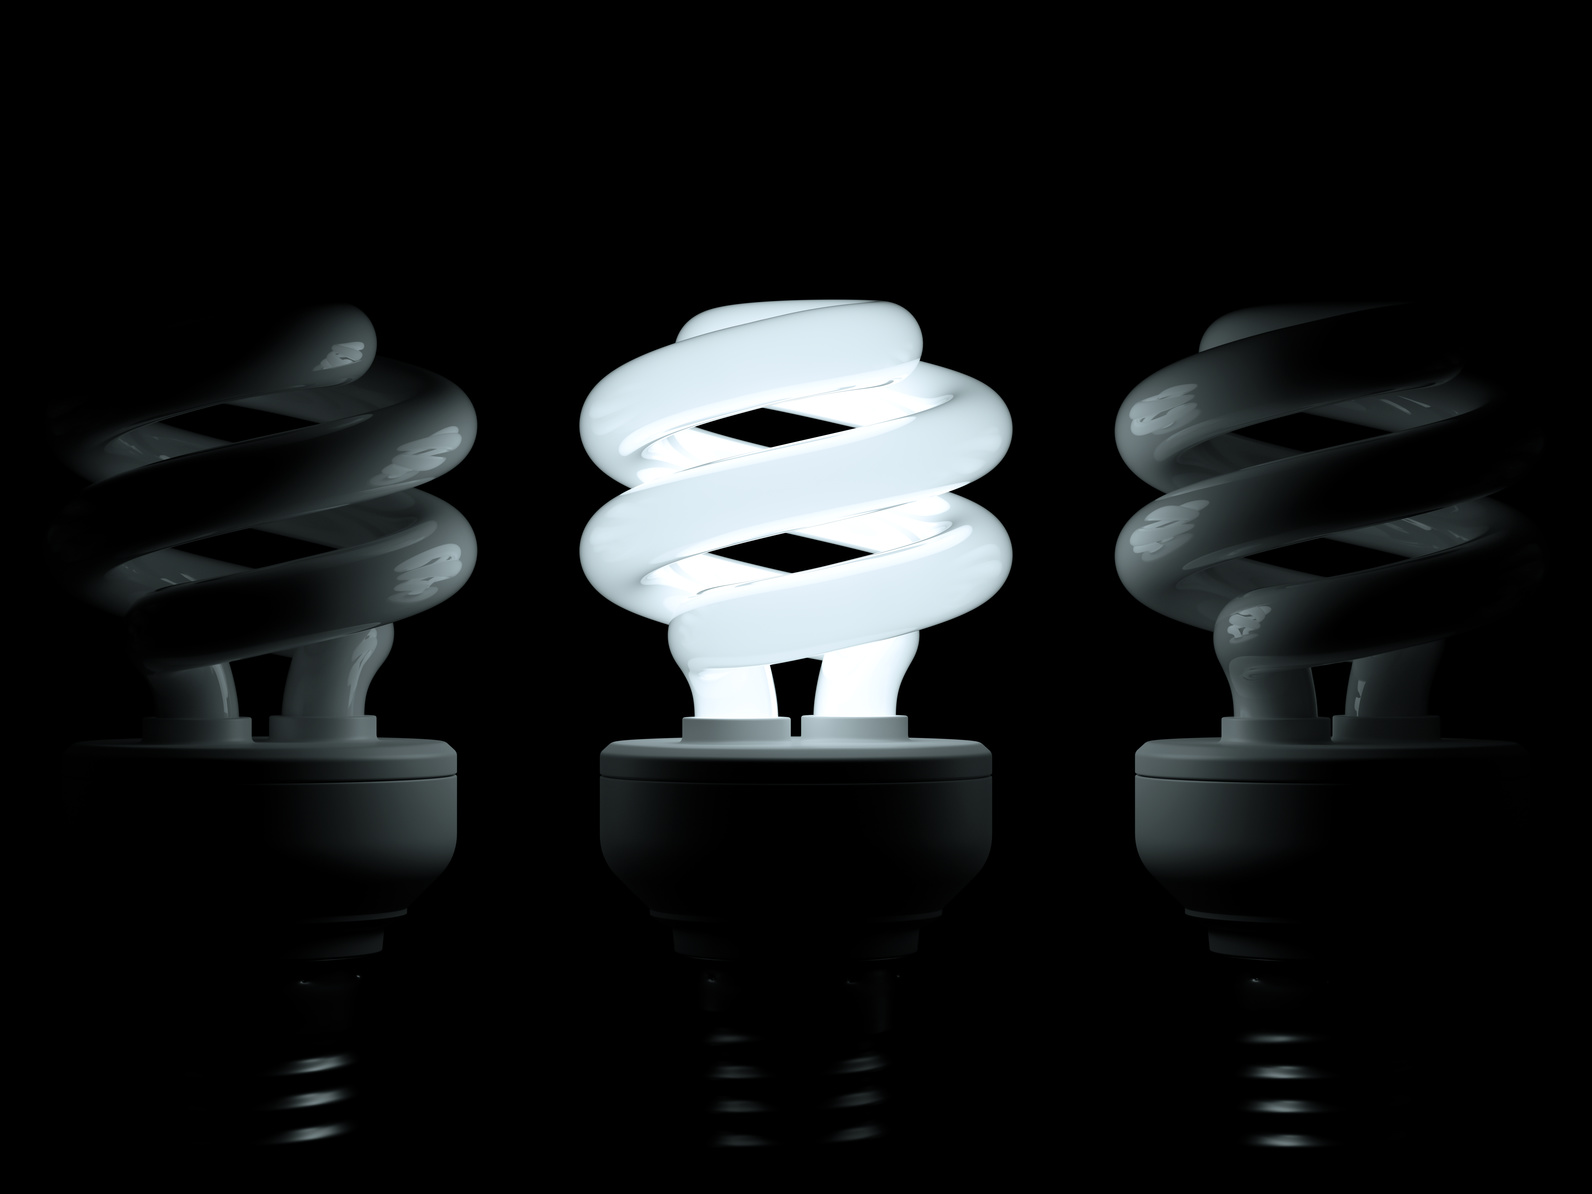 Glowing lightbulb illuminating other ones